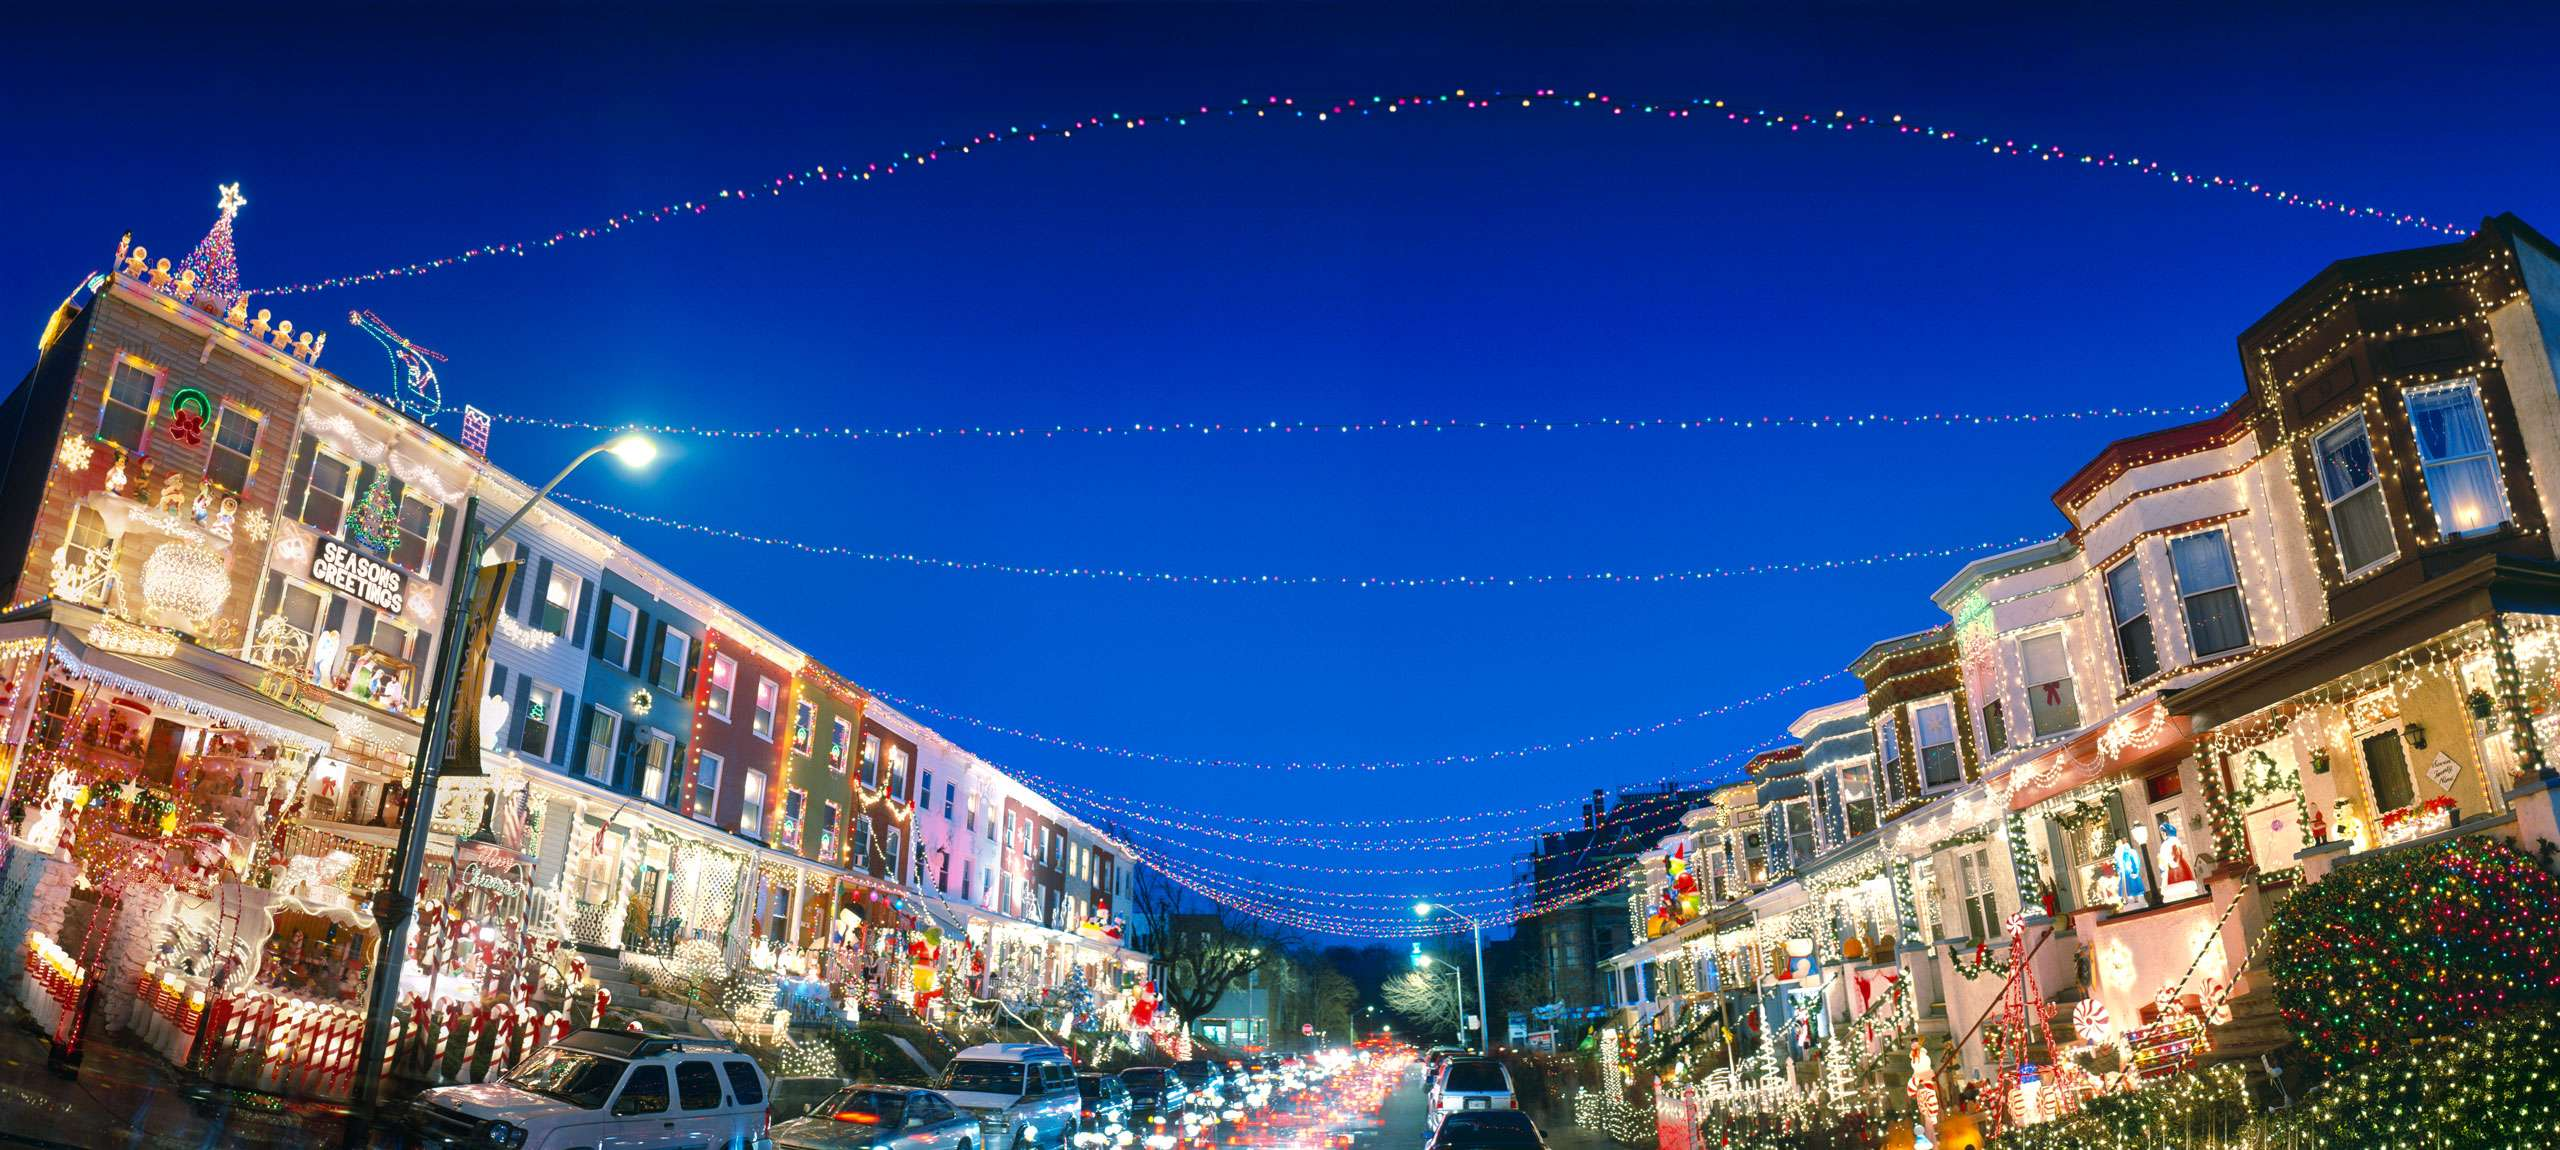 PORTFOLIO - Baltimore - Neighborhoods   #17  Houses with Christmas Decorations, 34th Street Hampden